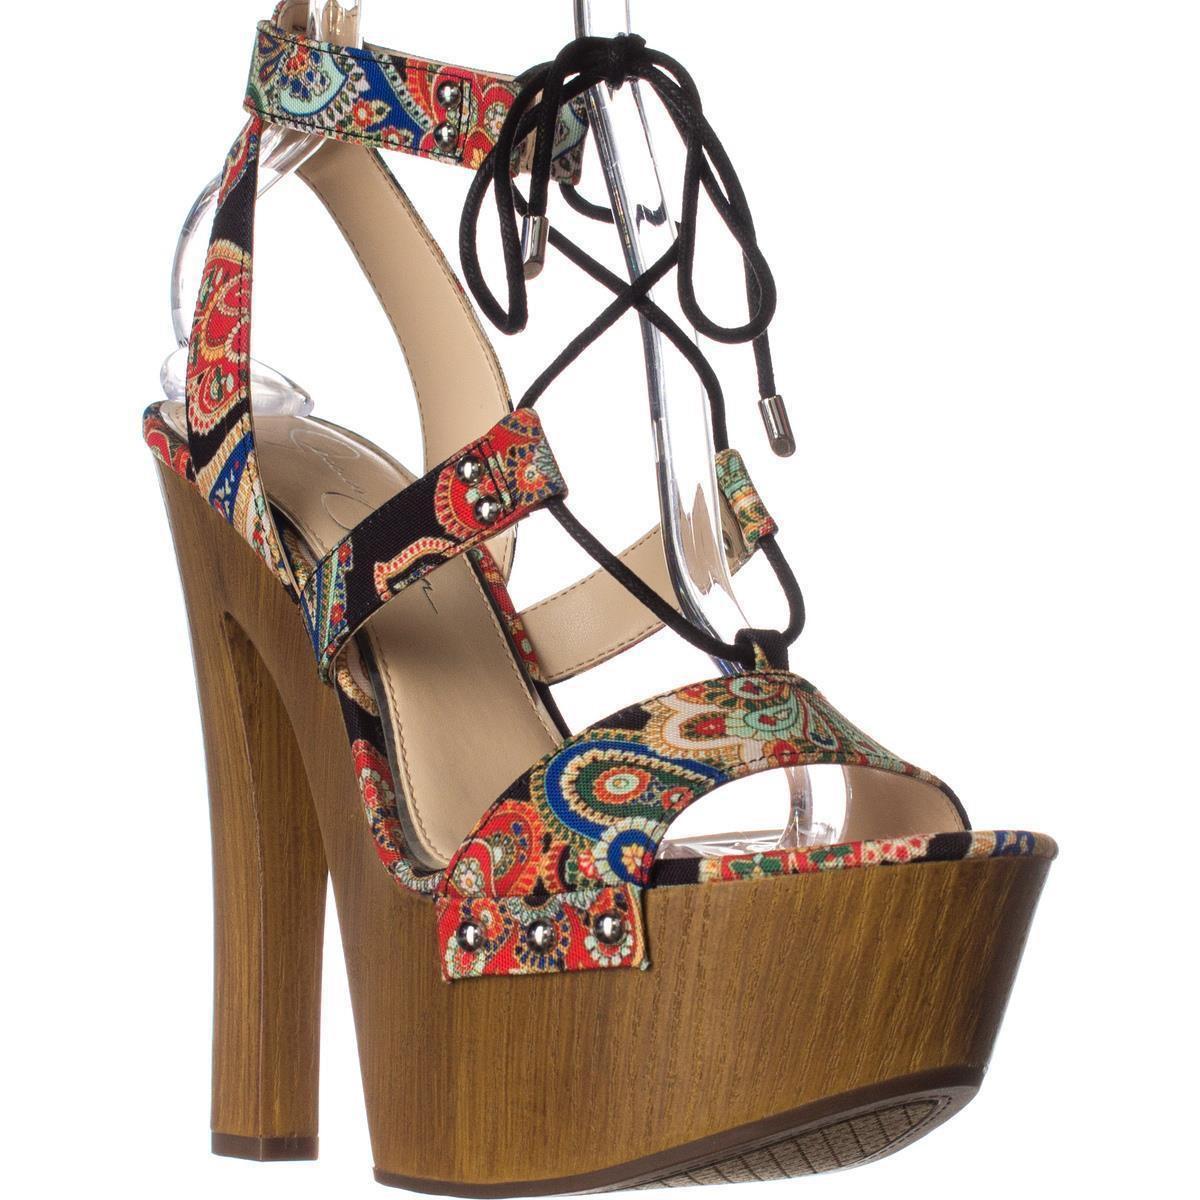 dde2255e8f51 Lyst - Jessica Simpson Doreena Ankle Tie Platform Sandals